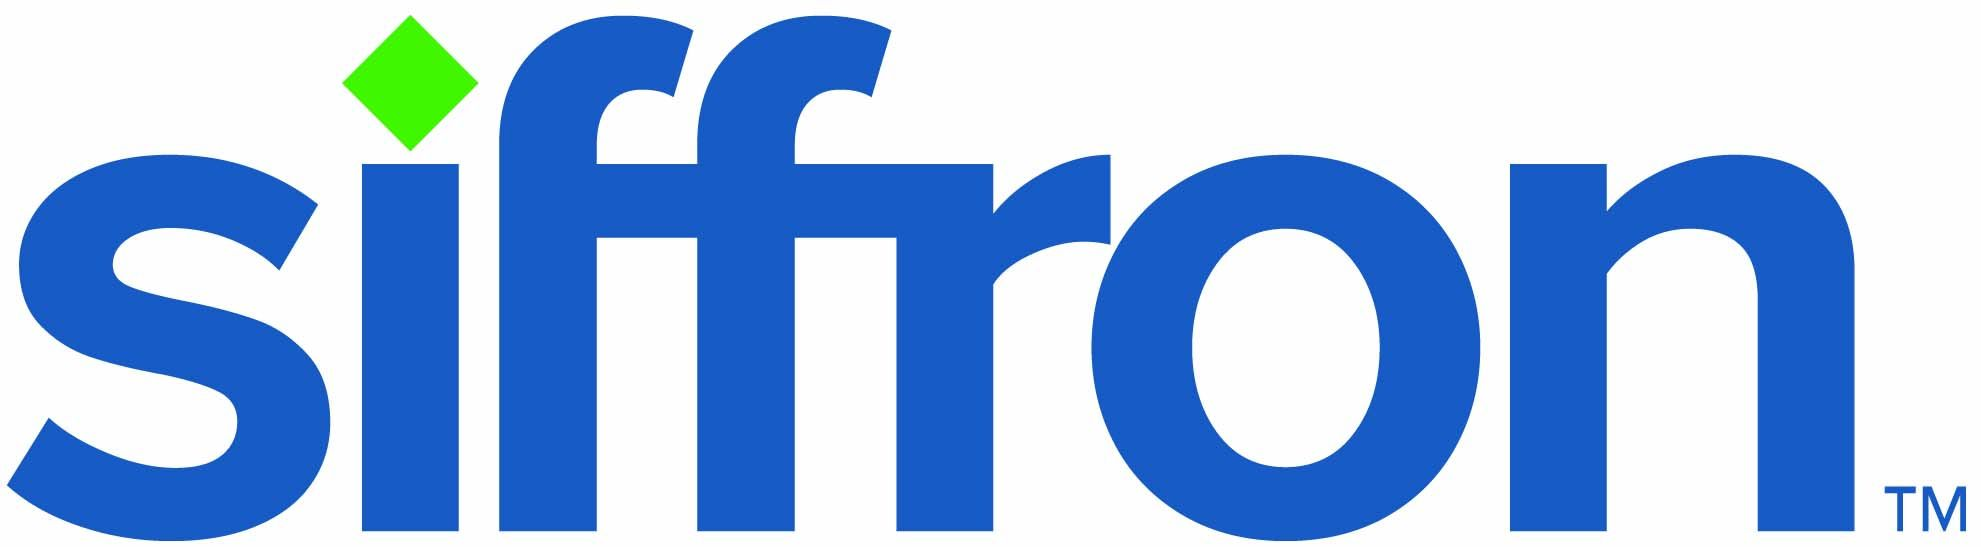 siffron Logo